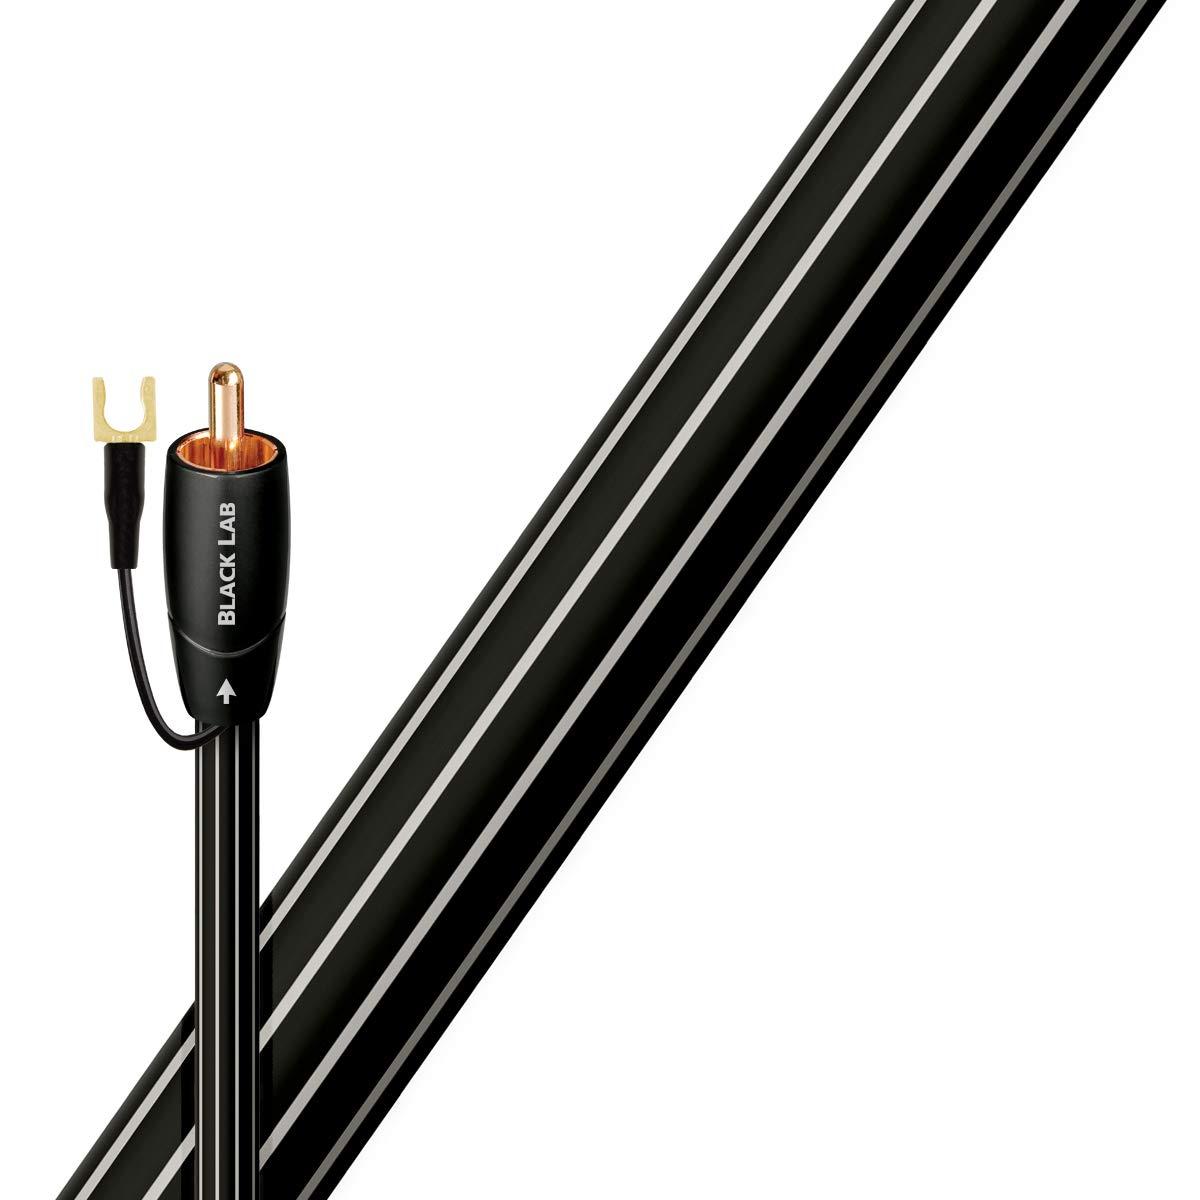 Cinch, RCA, Kupfer, 3 m Audiokabel Schwarz AudioQuest 3m Black Lab Cinch-Kabel